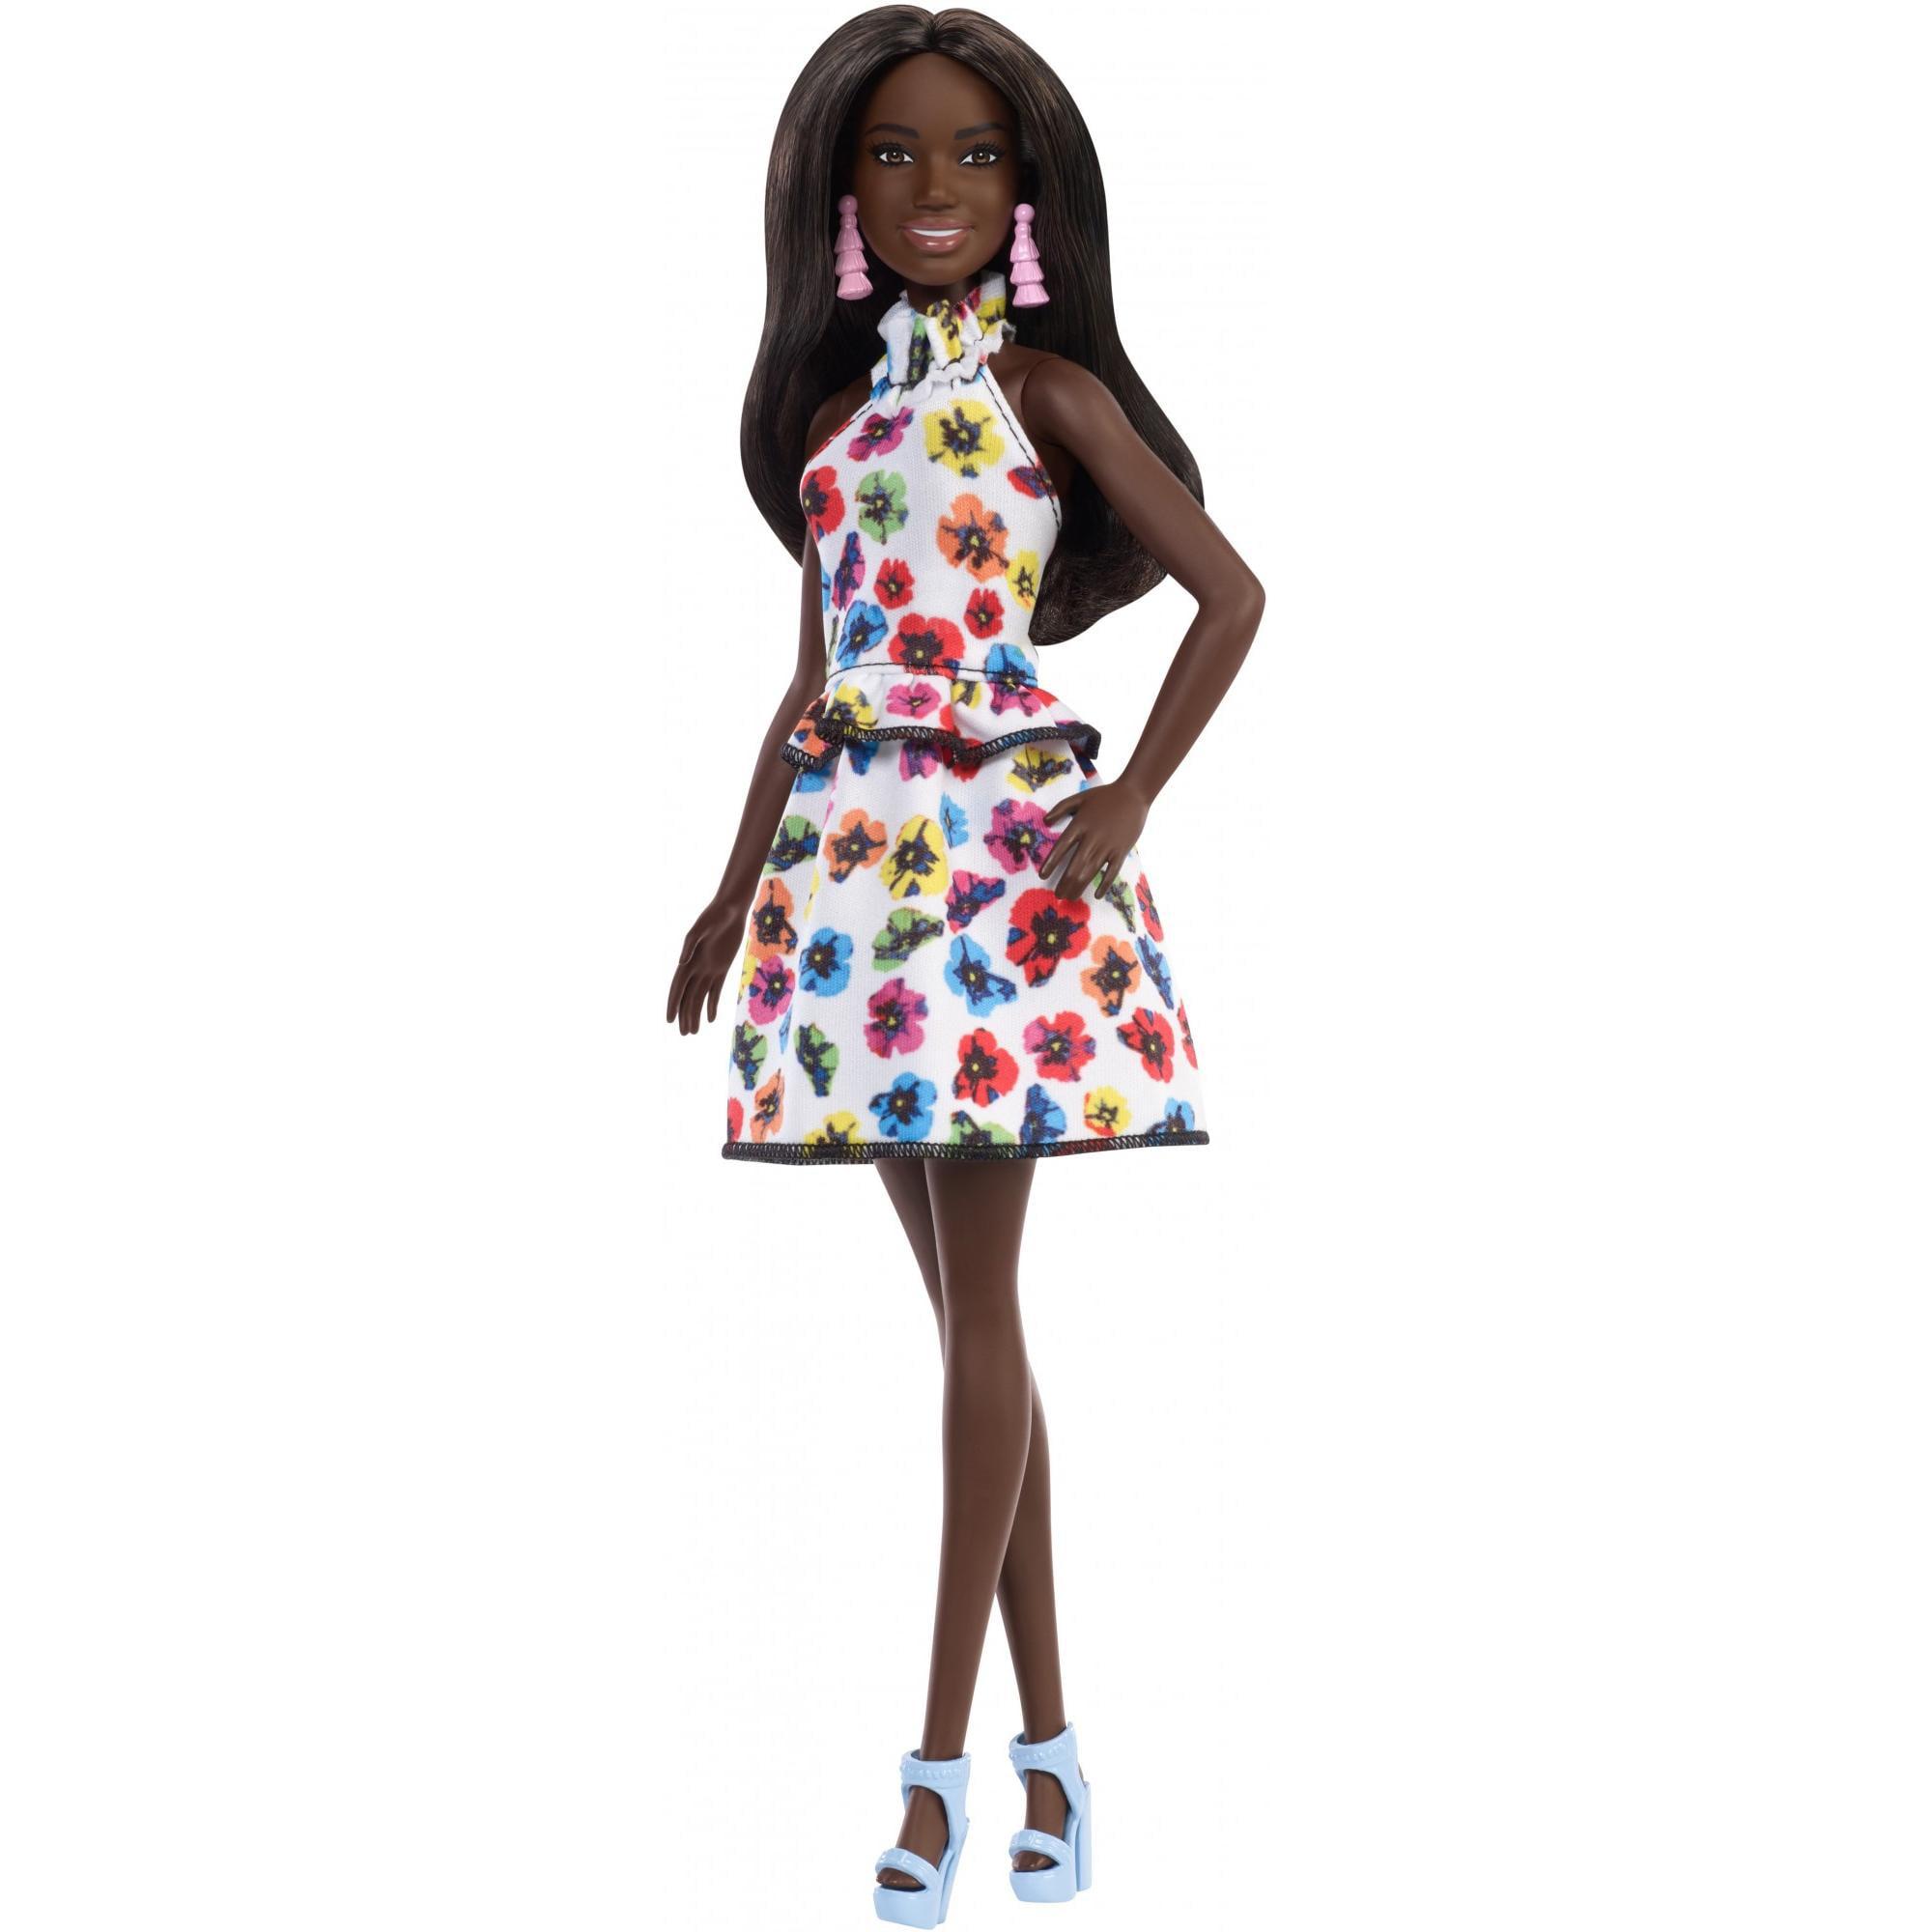 Barbie Fashionistas Doll, Original Body Type with Floral Dress